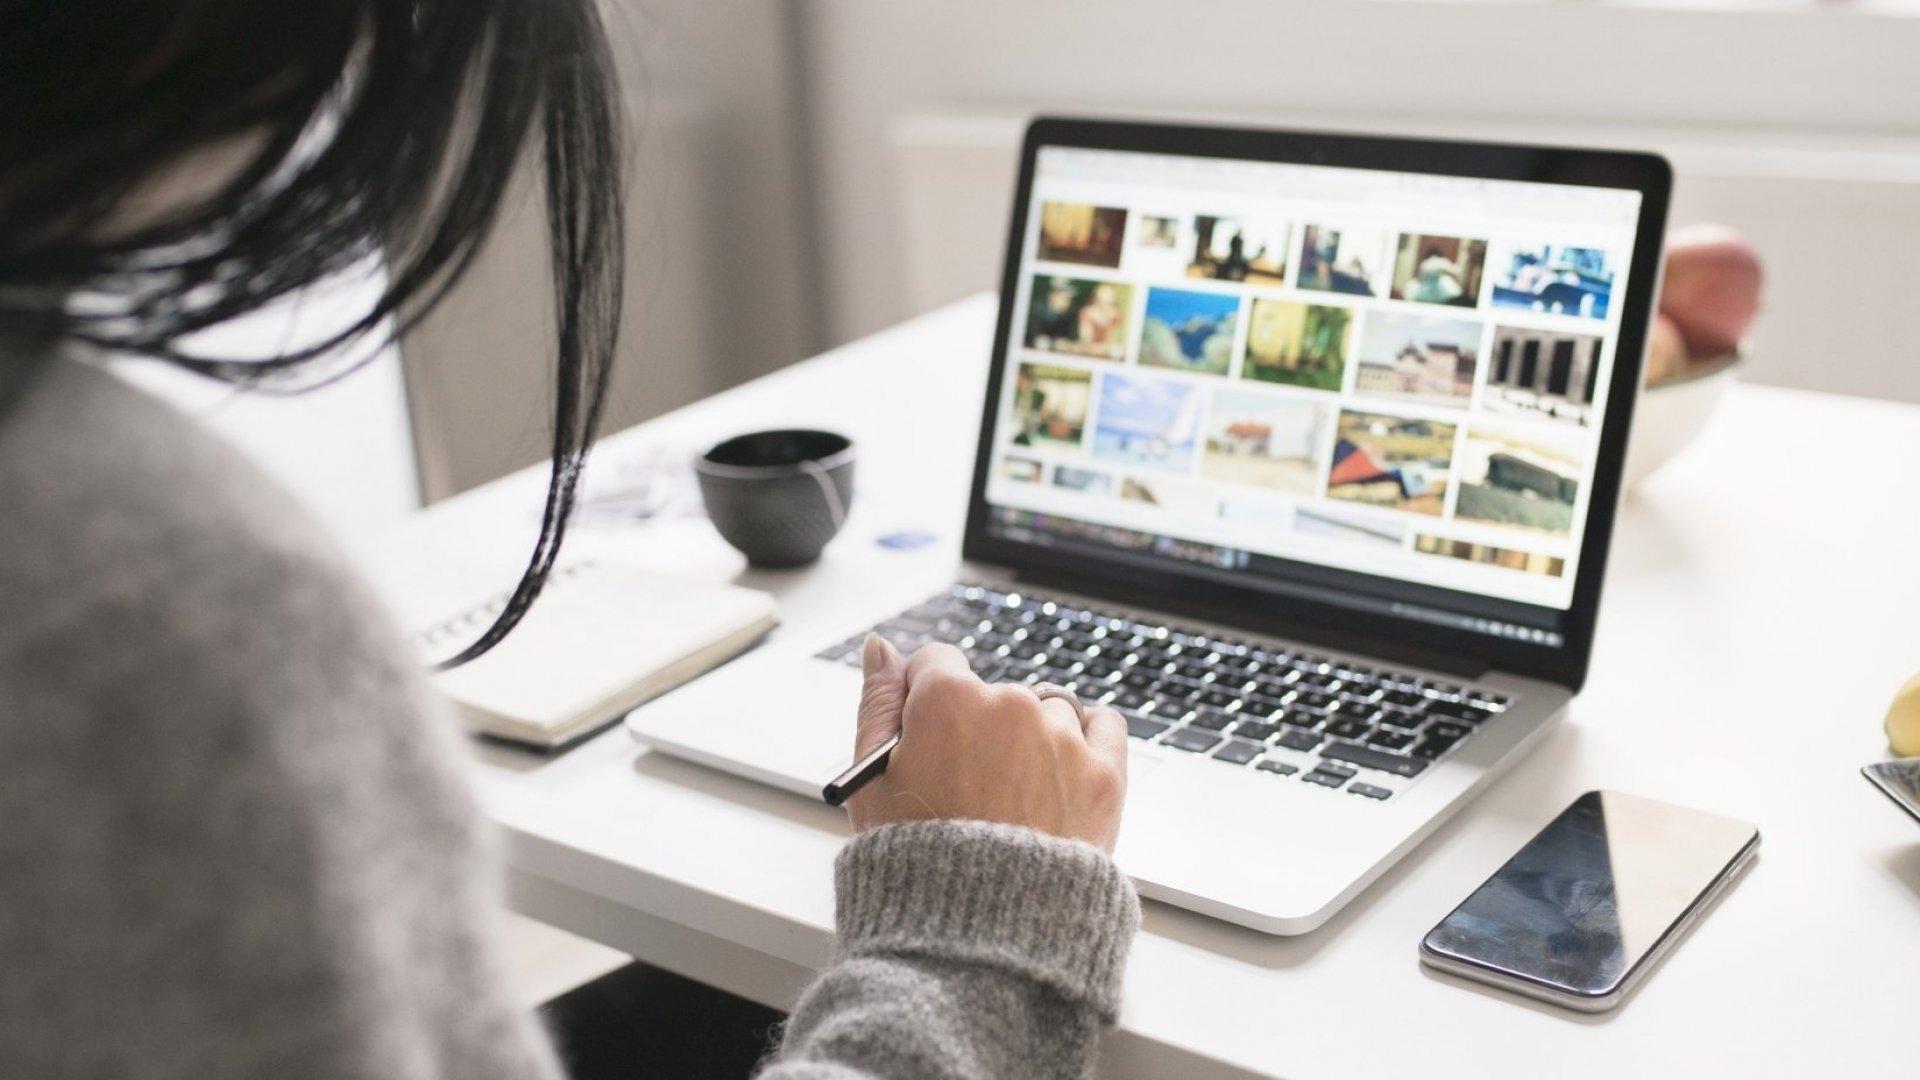 The No. 1 Personal Branding Secret That Gives You a Massive Advantage Online